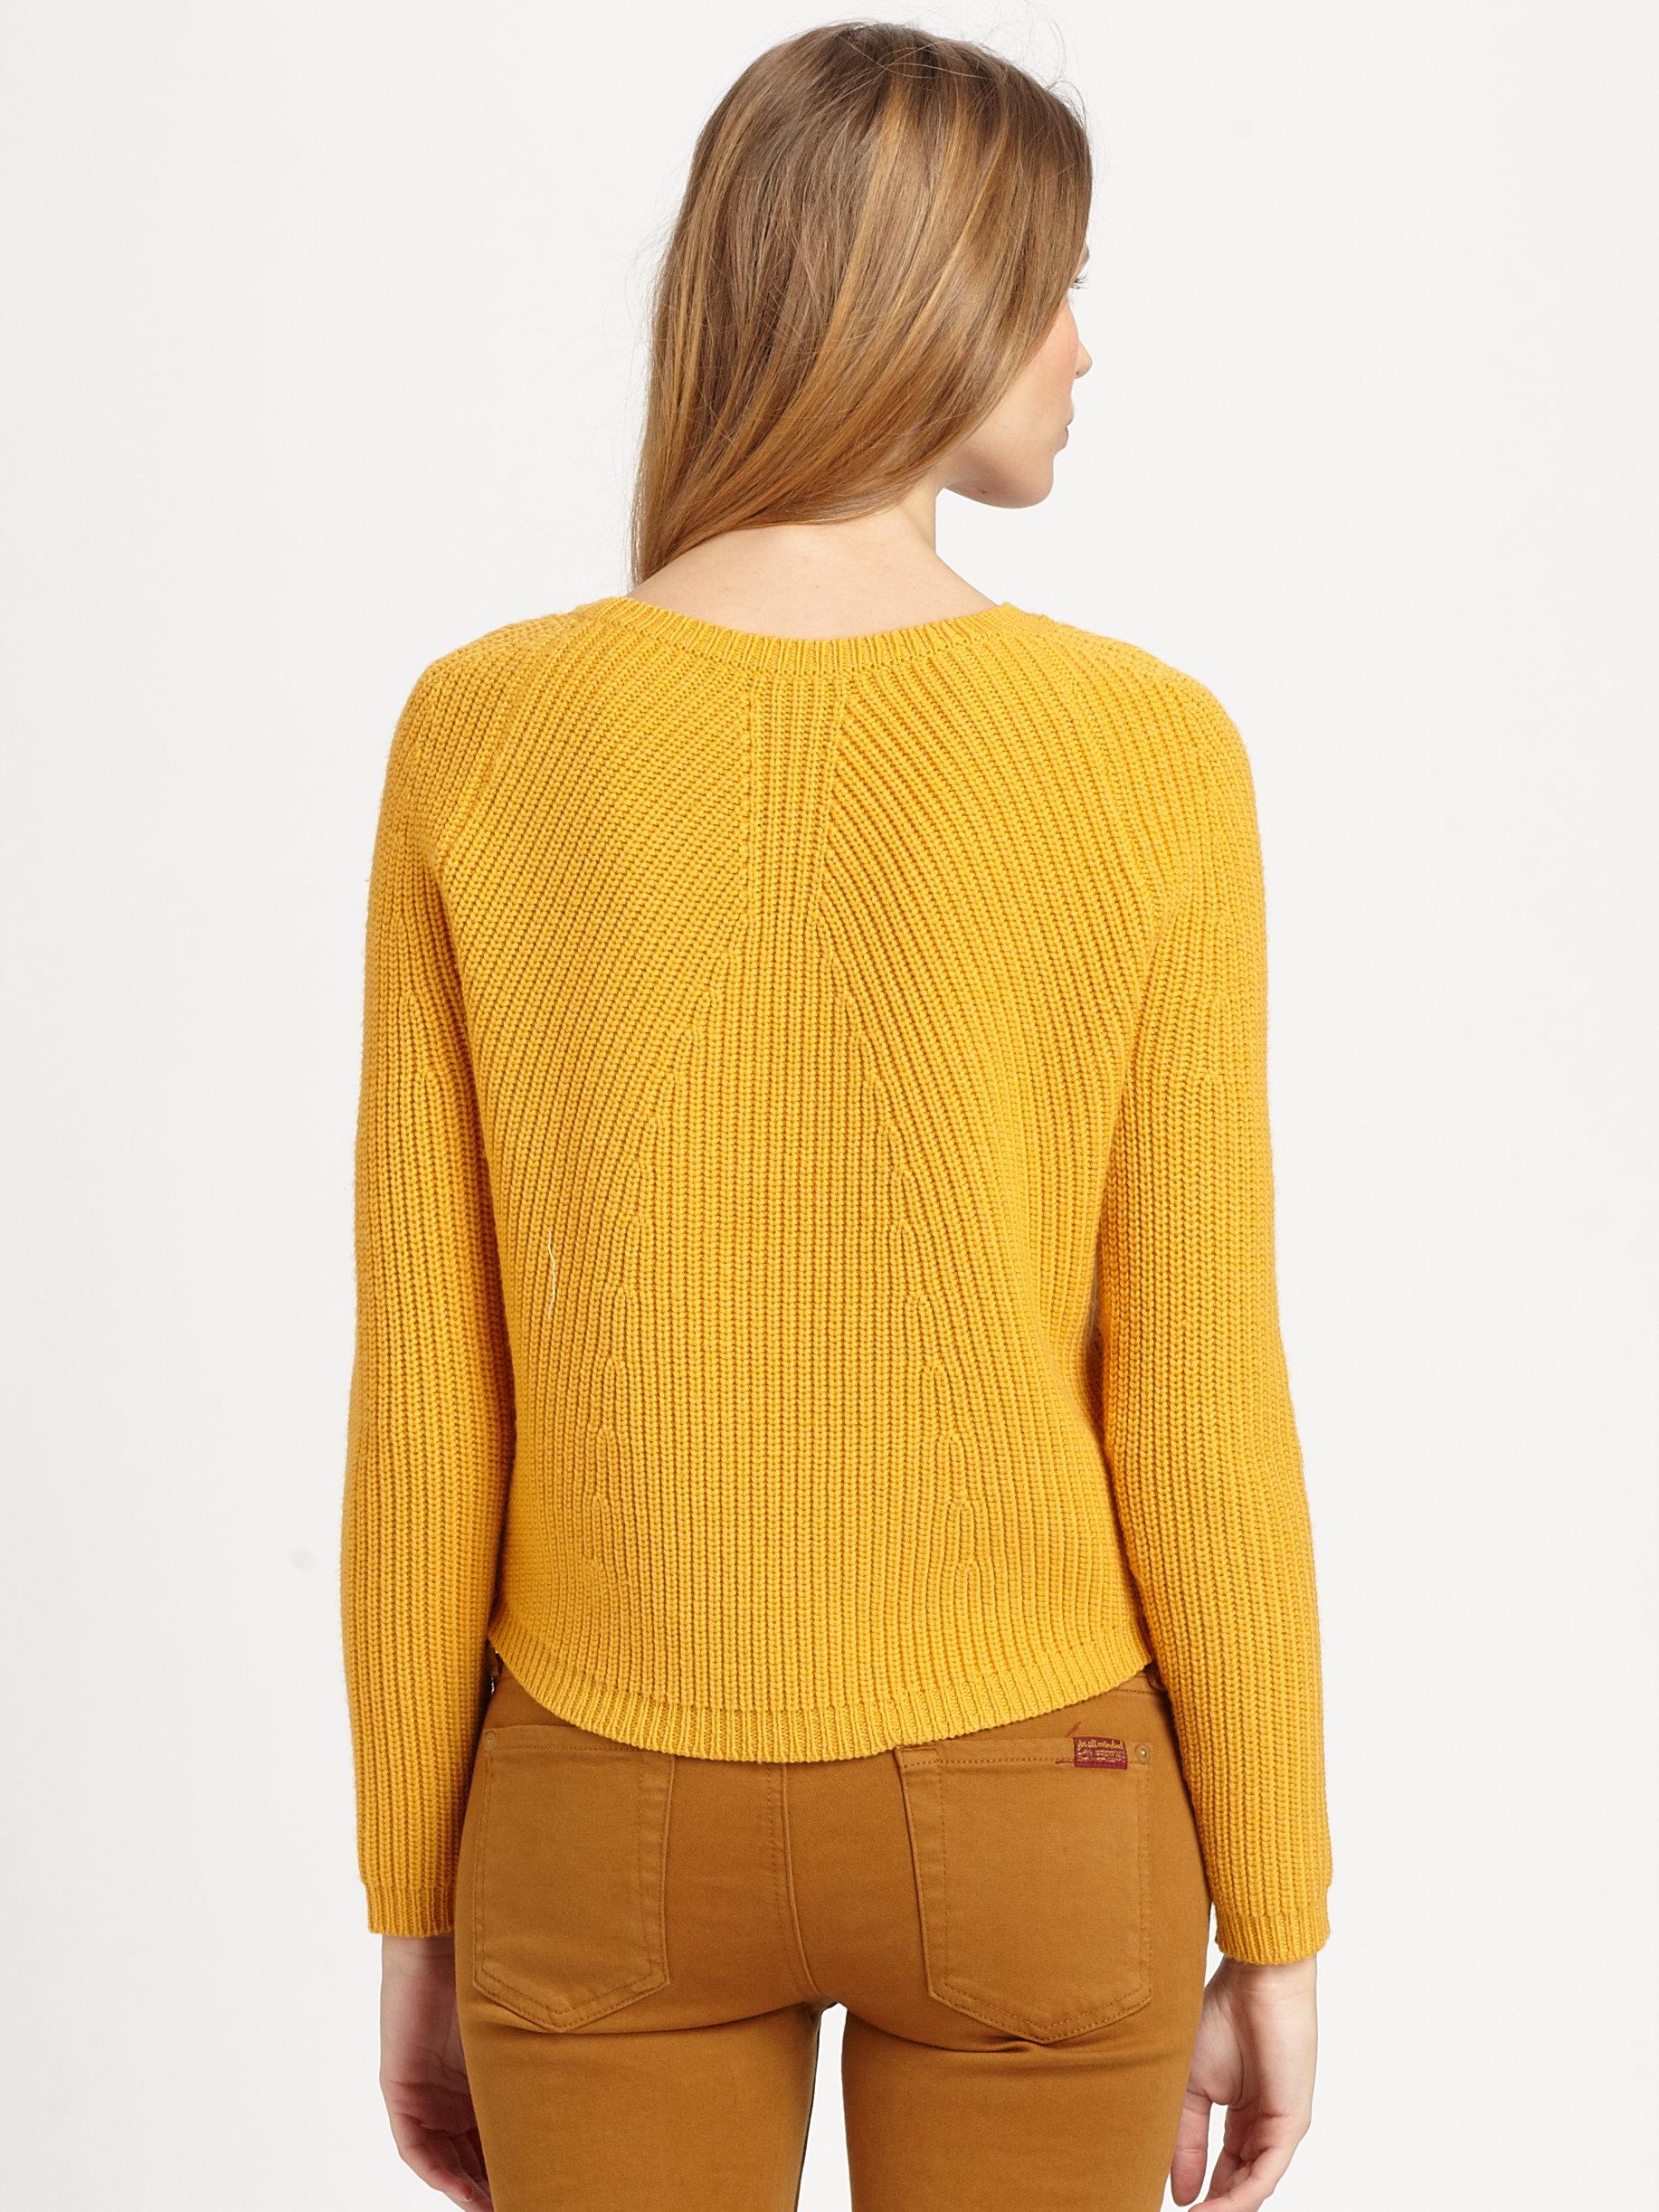 Theory Jaydee Wool Sweater in Yellow | Lyst